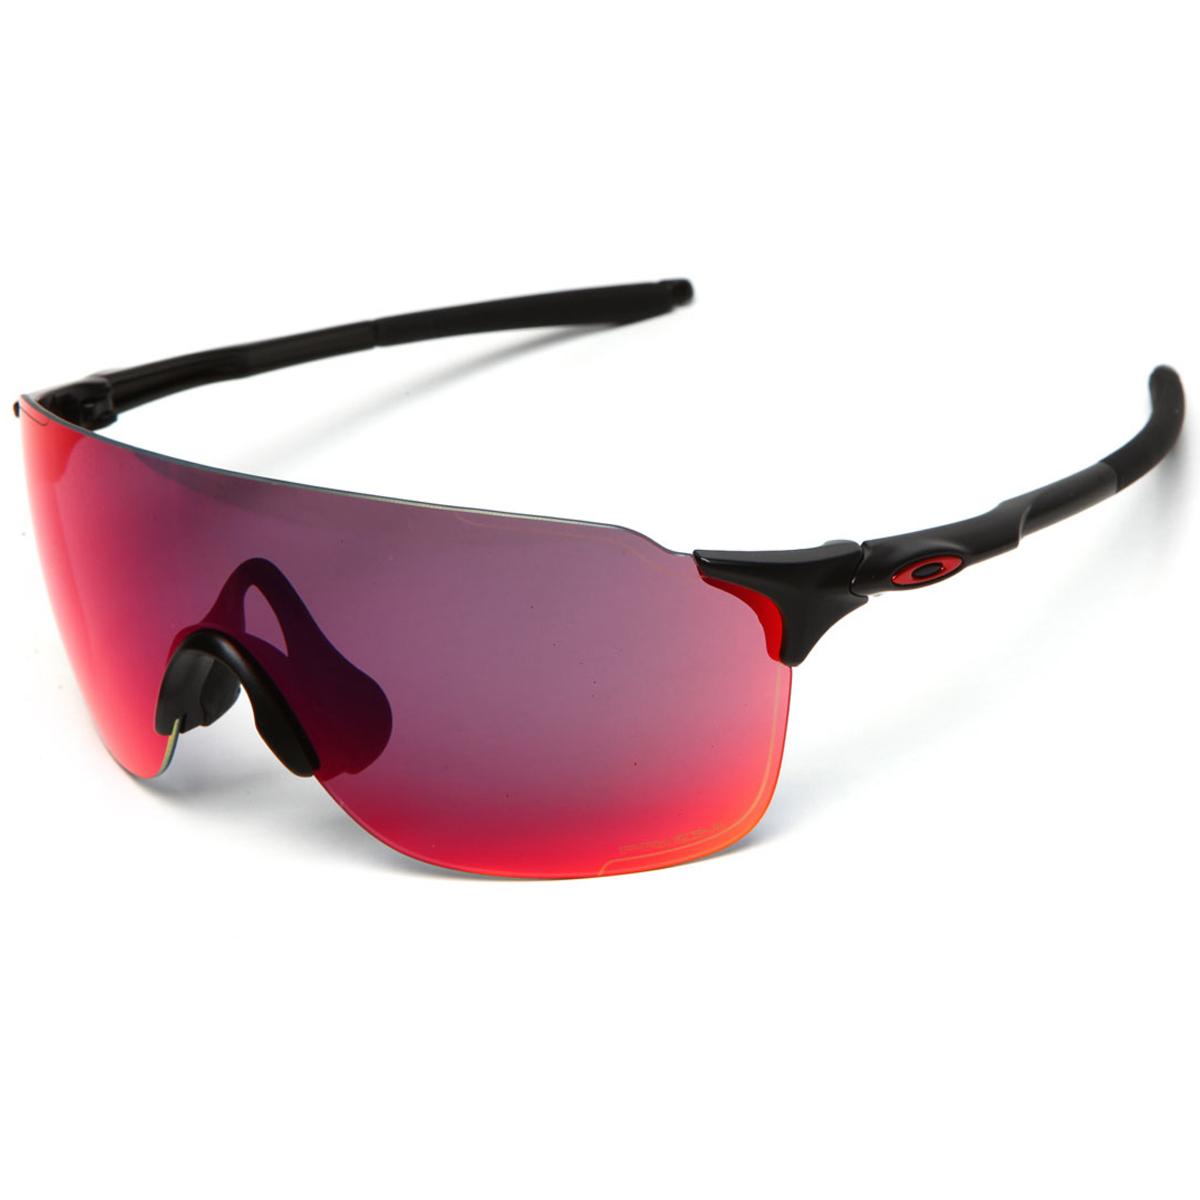 fc9257751c8af Óculos Oakley Evzero Stride Matte Black  Lente Prizm Trail passe o mouse  para ver em zoom